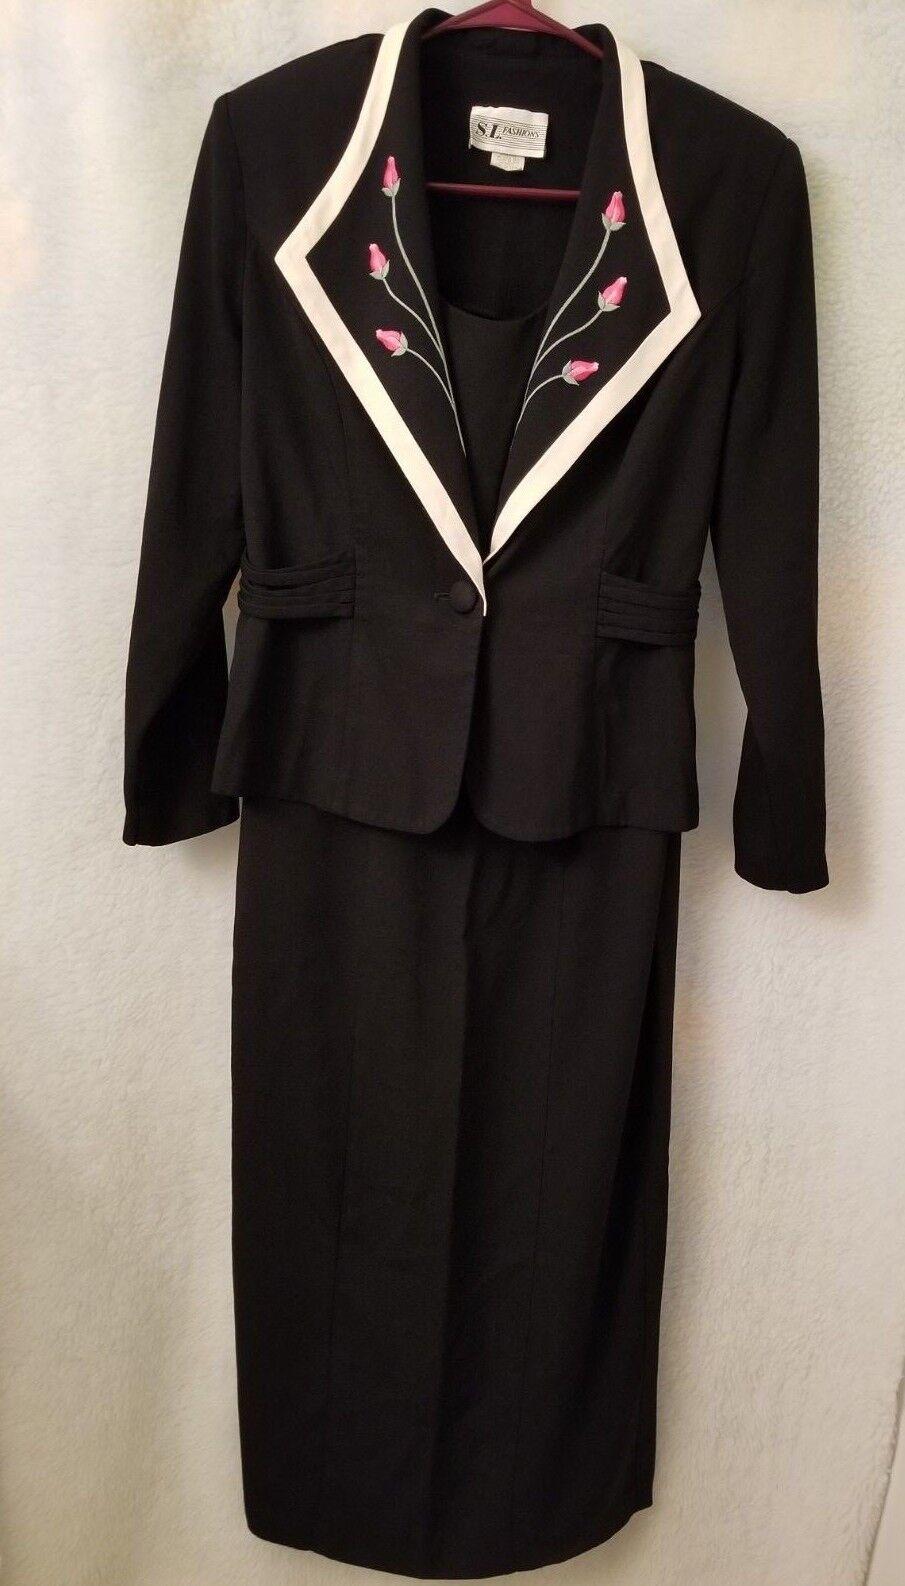 S.L. Fashions damen schwarz Rosa Ivory Grün Floral Jacket And Dress Set Größe 14